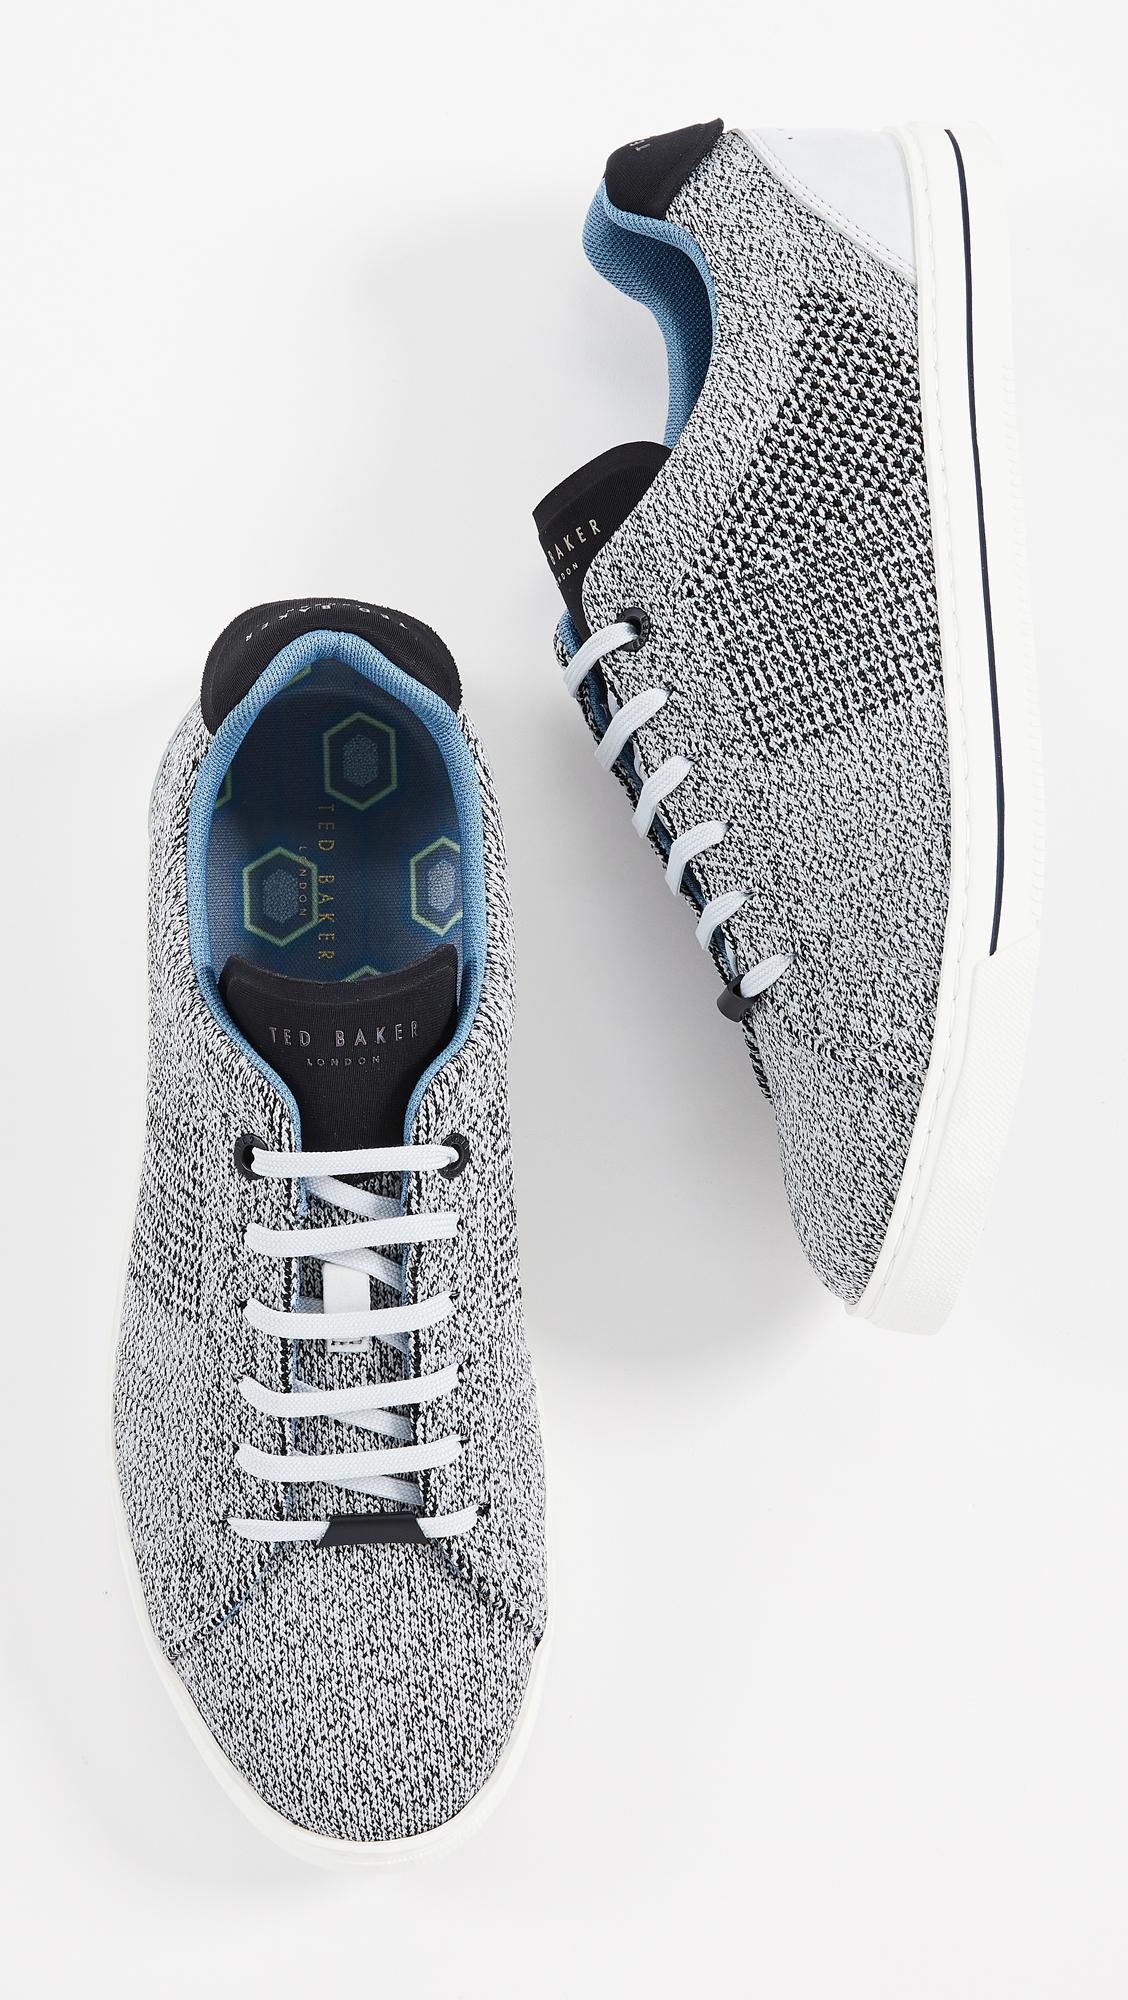 e357e59c574bc Ted Baker Plowns Flyknit Sneakers   EAST DANE